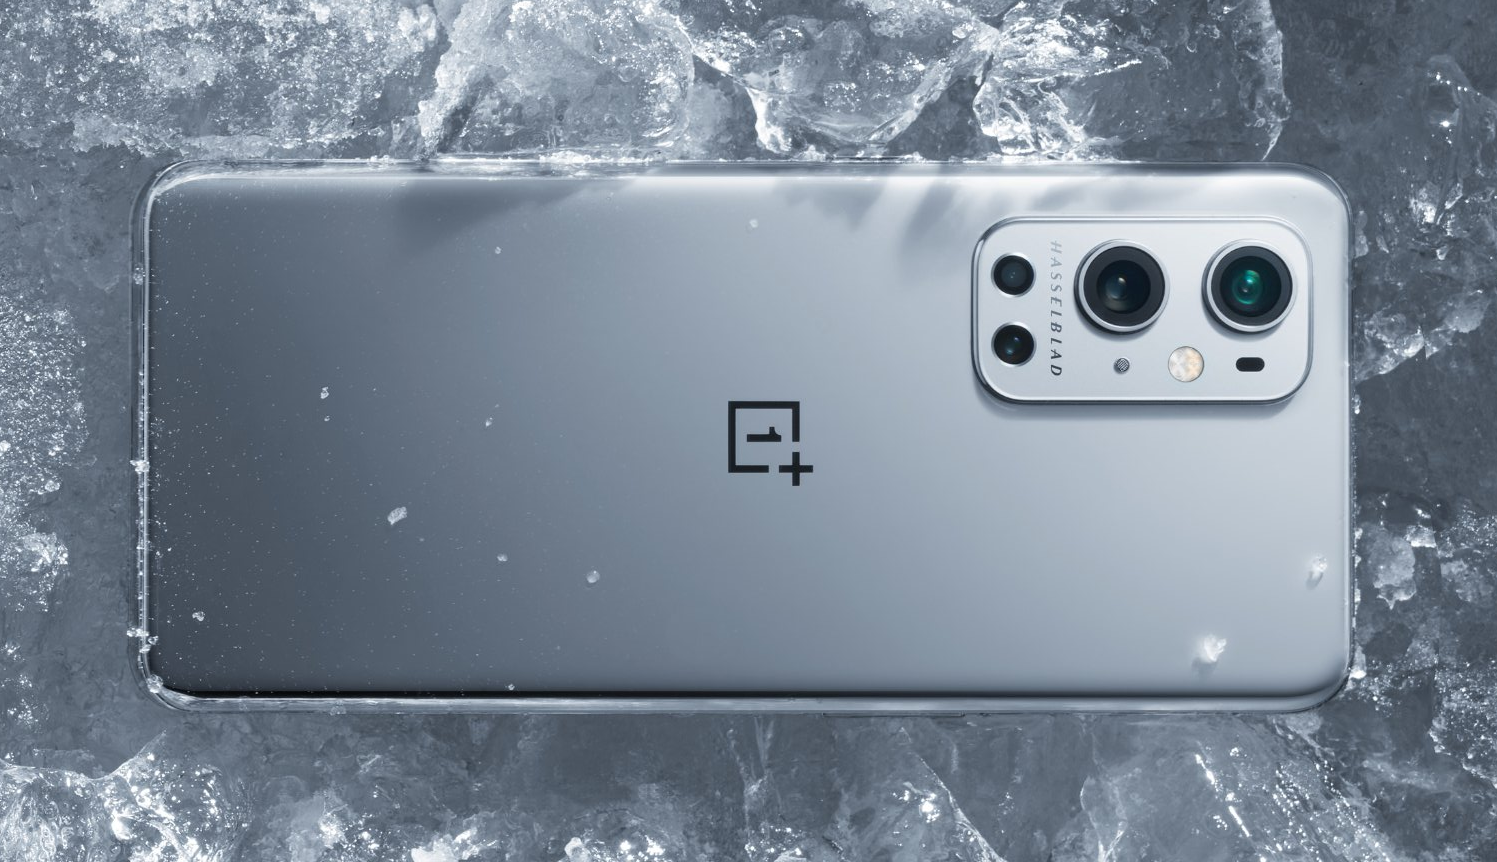 OnePlus 9 Pro Hasselblad Camera, 2021 OnePlus 9 Pro Smartphone